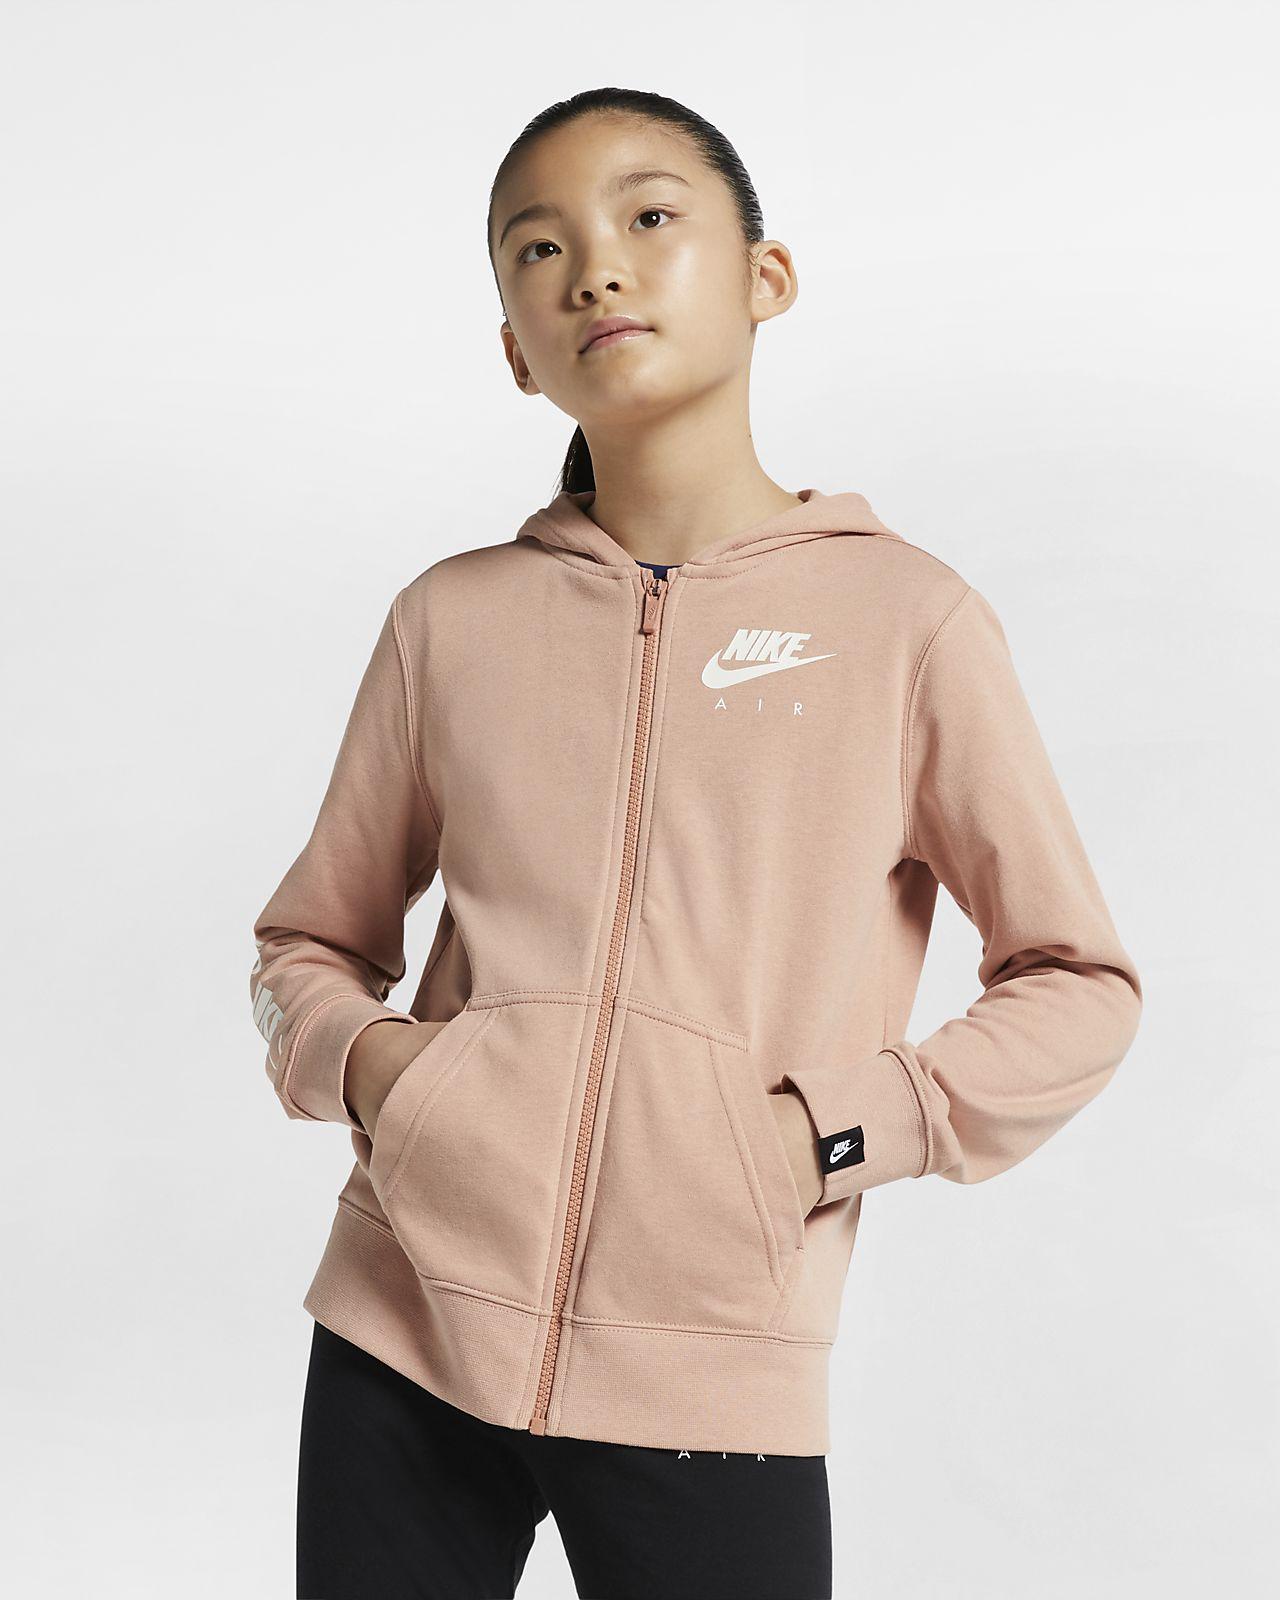 Nike Air Dessuadora amb caputxa i cremallera completa - Nena